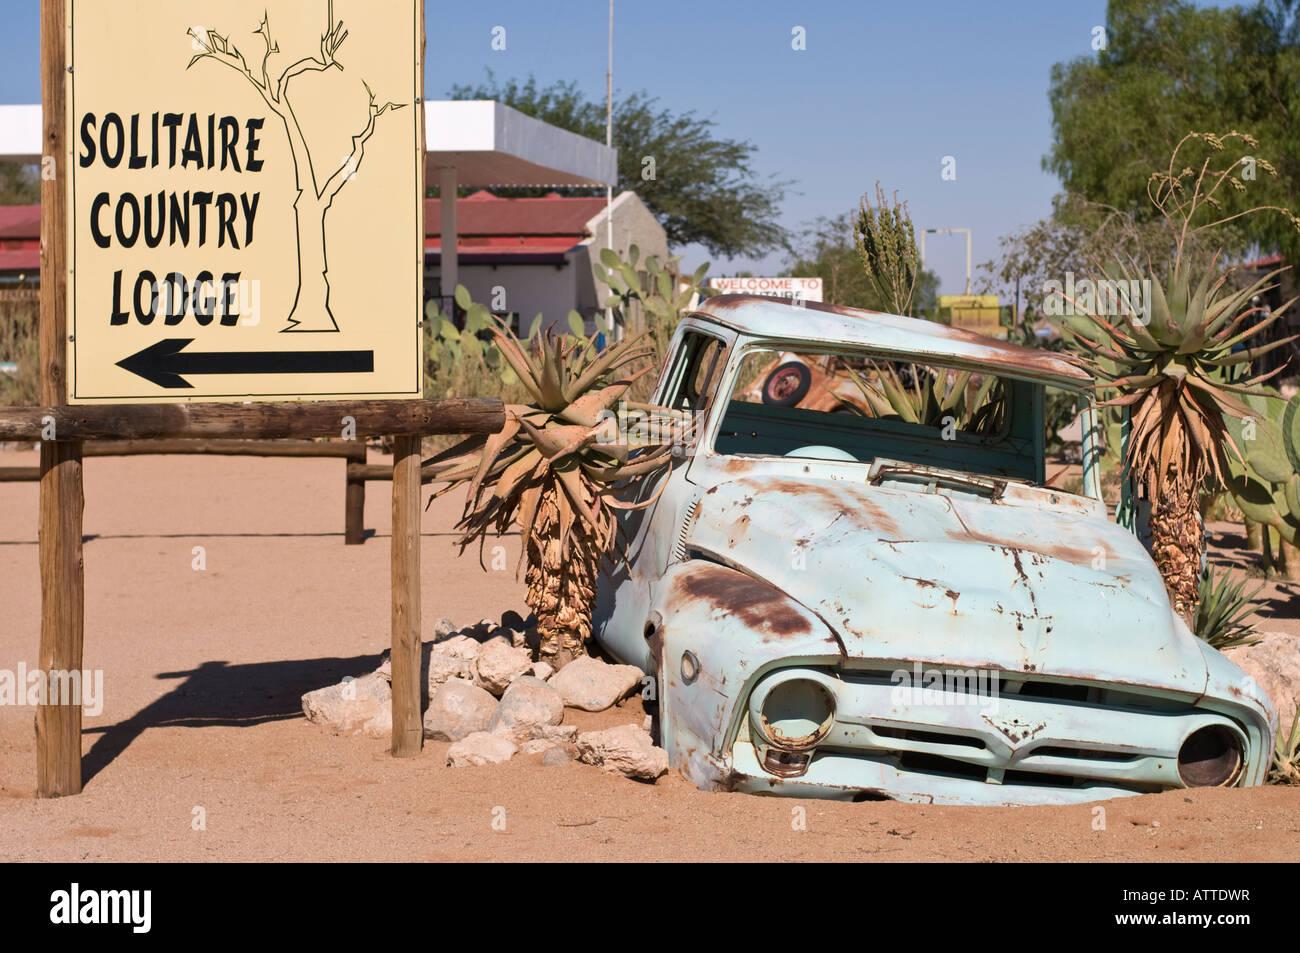 La Namibie Solitaire Photo Stock